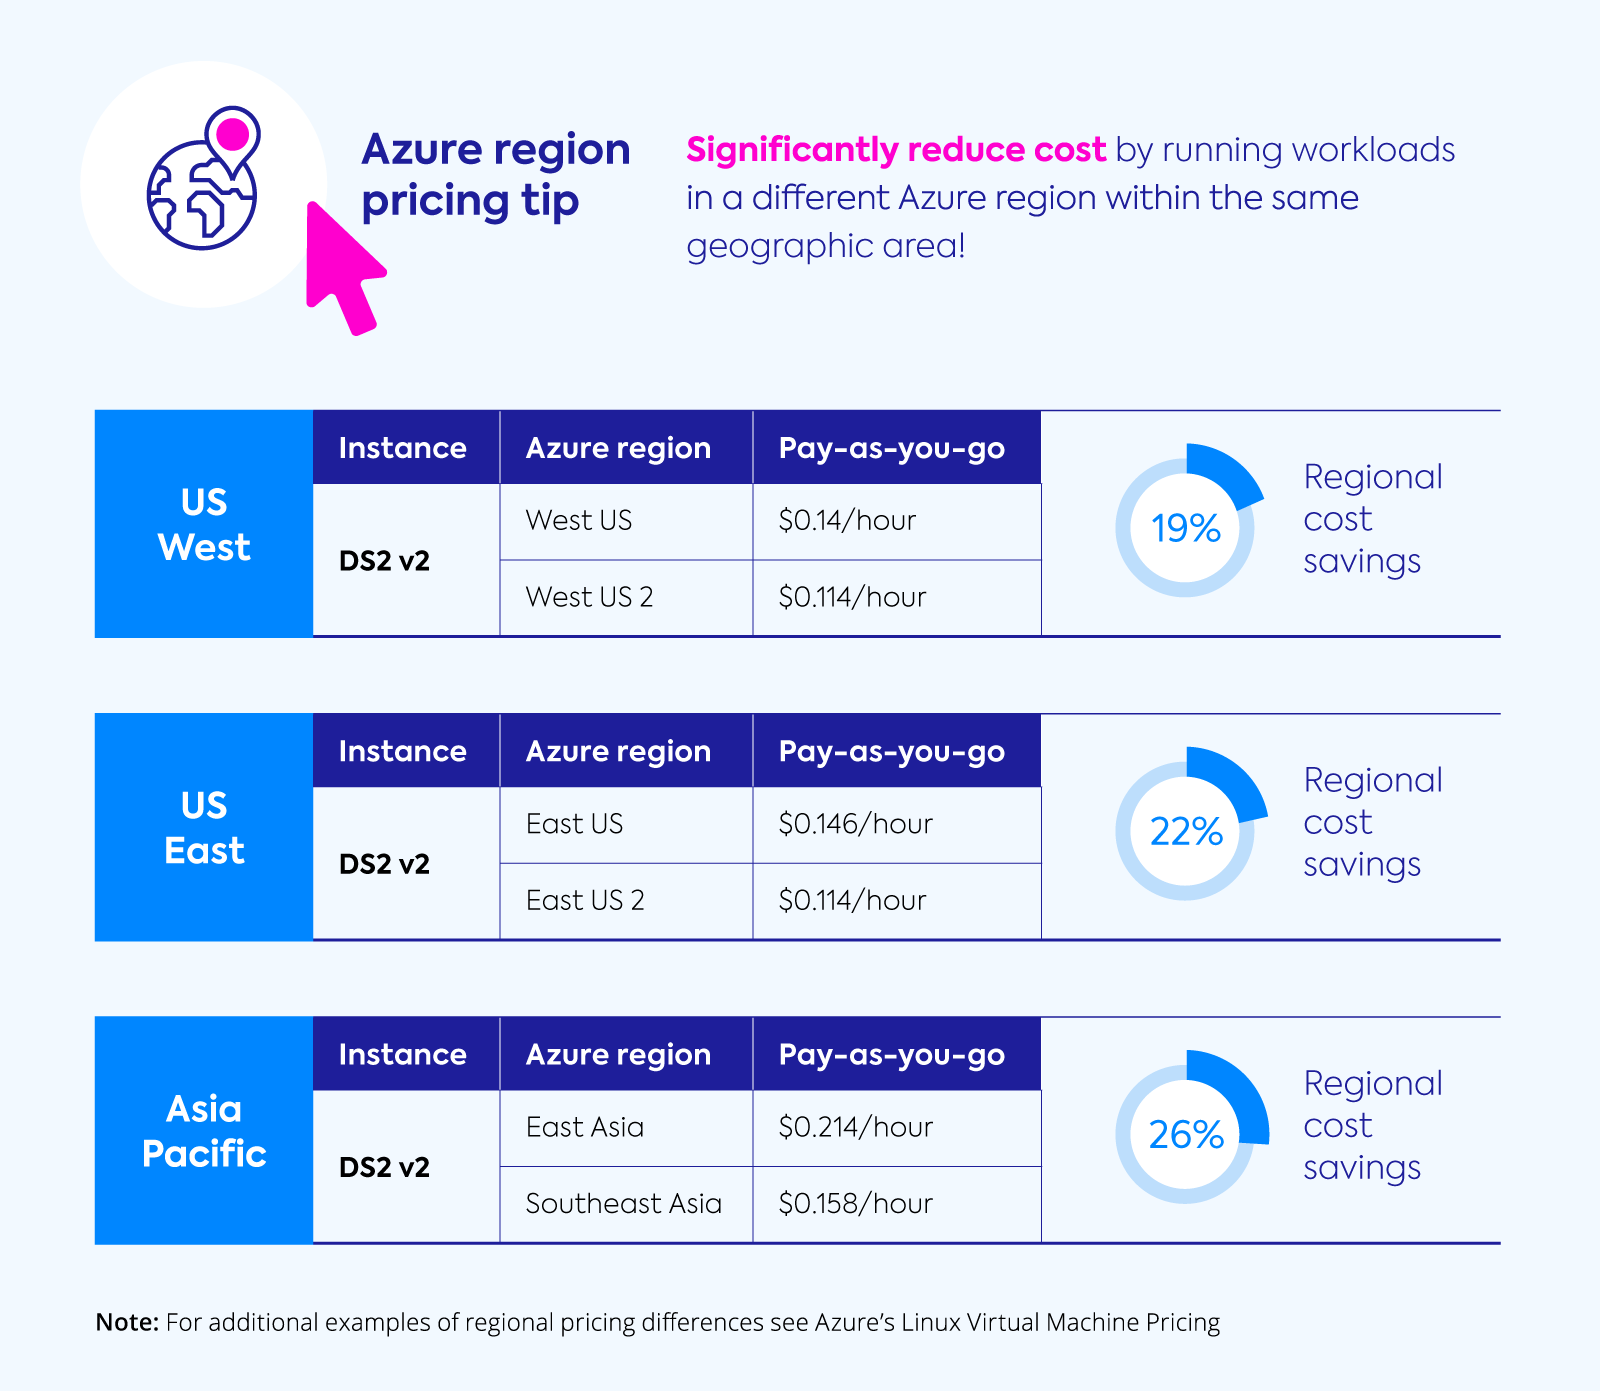 Azure VM pricing in different regions